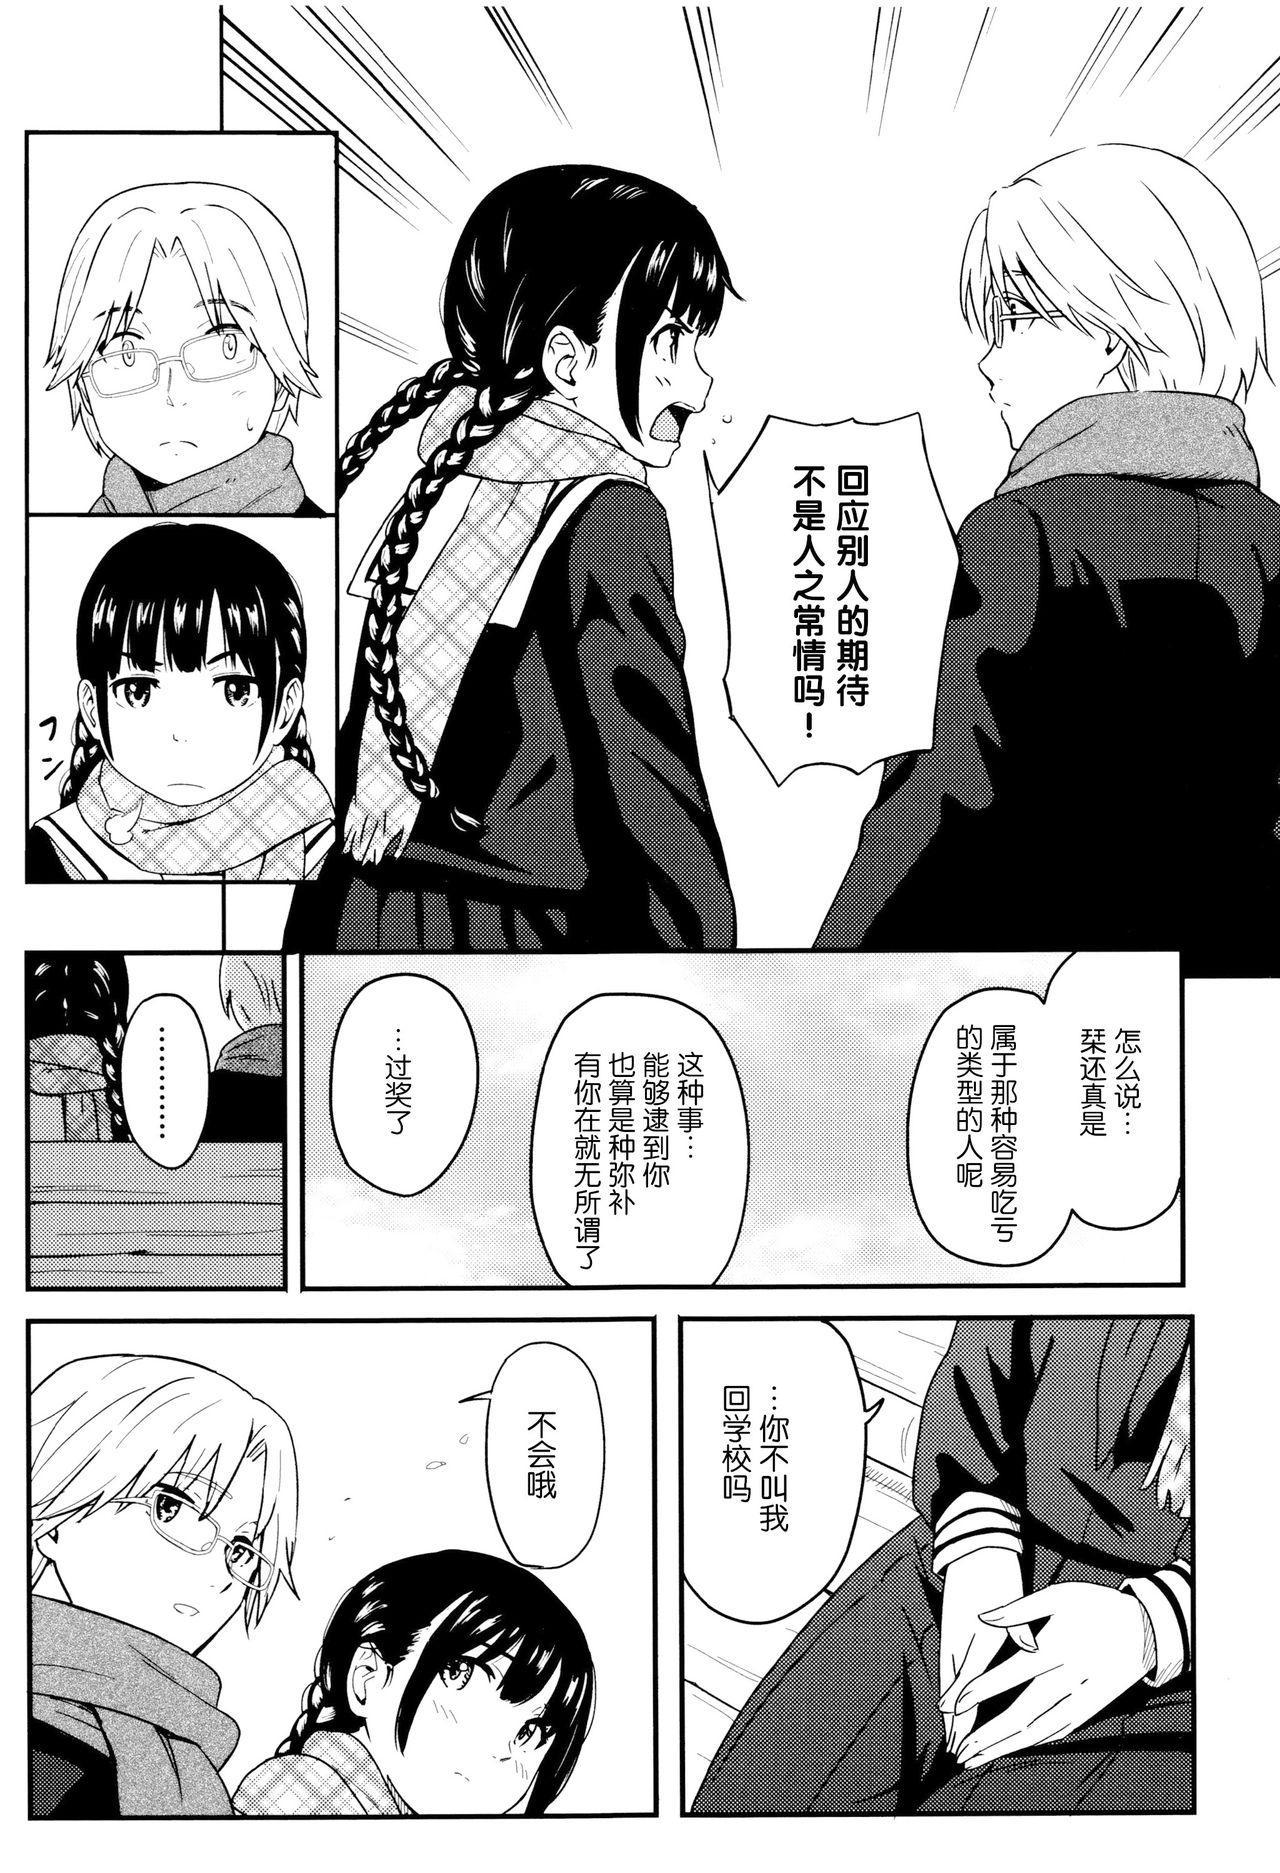 Tokubetsu na Mainichi - Special daily 95